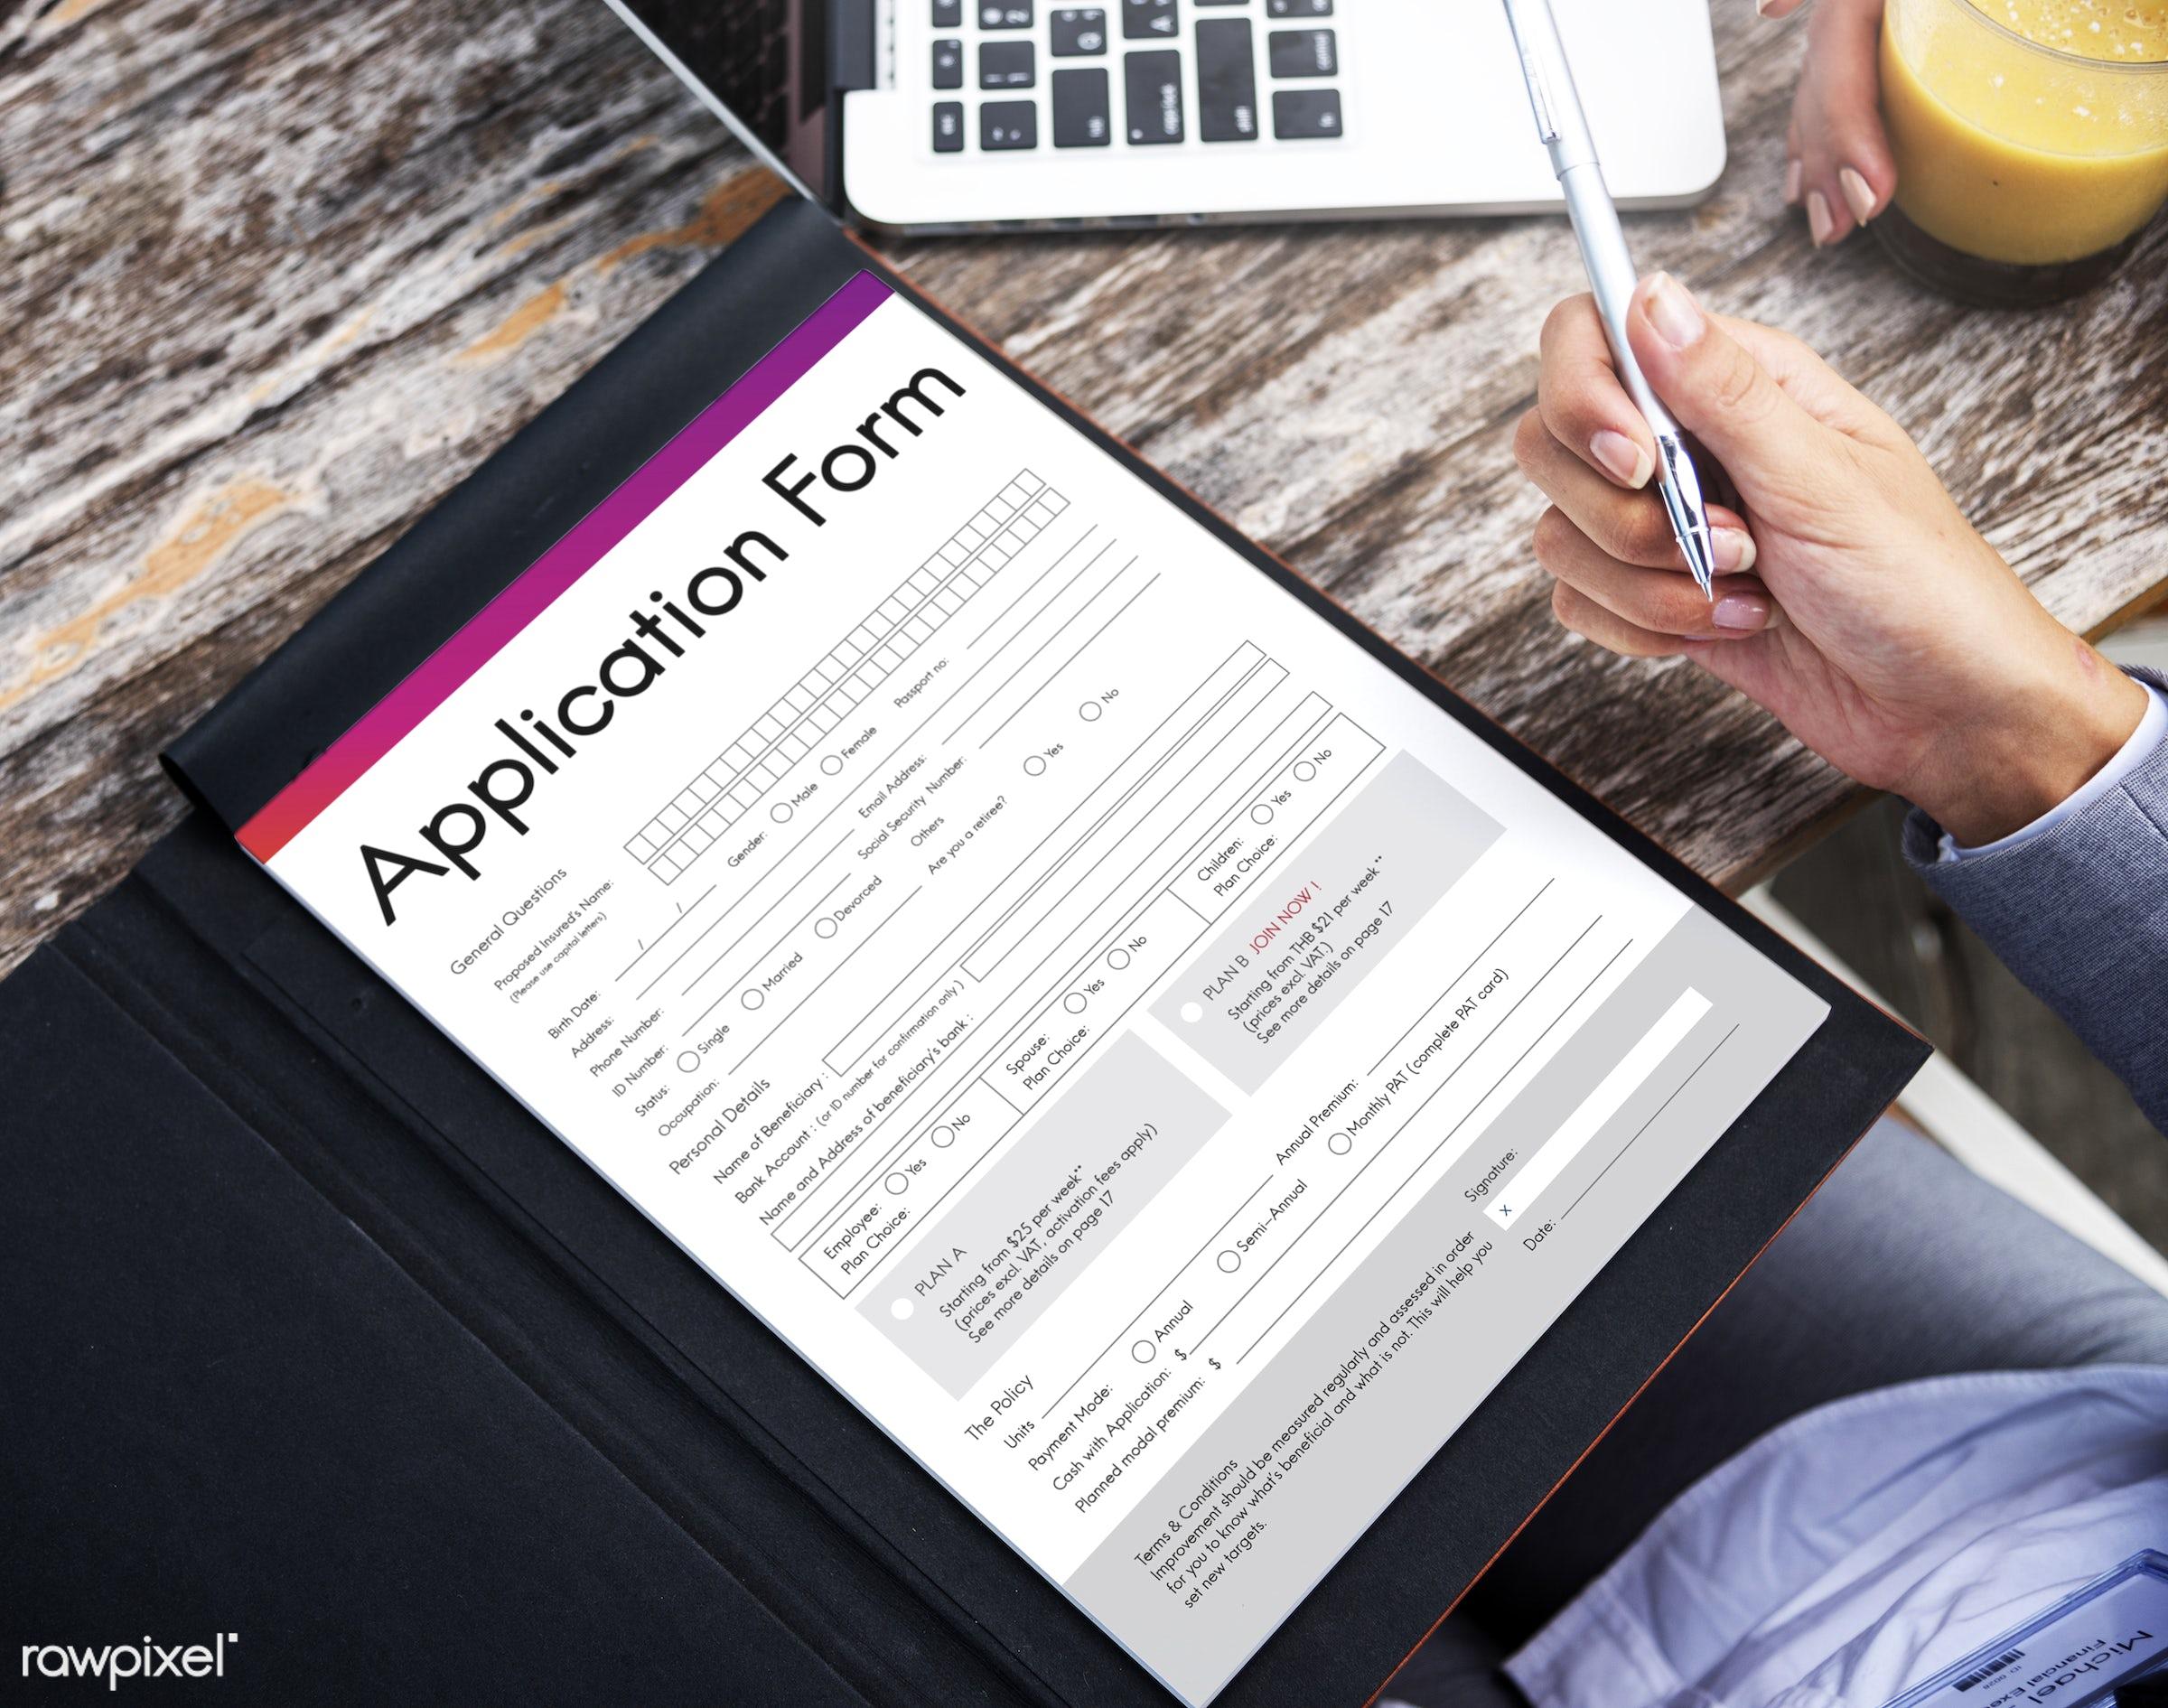 applicant, application, business, businesswoman, businesswomen, data, digital, digital device, document, drink, file, folder...